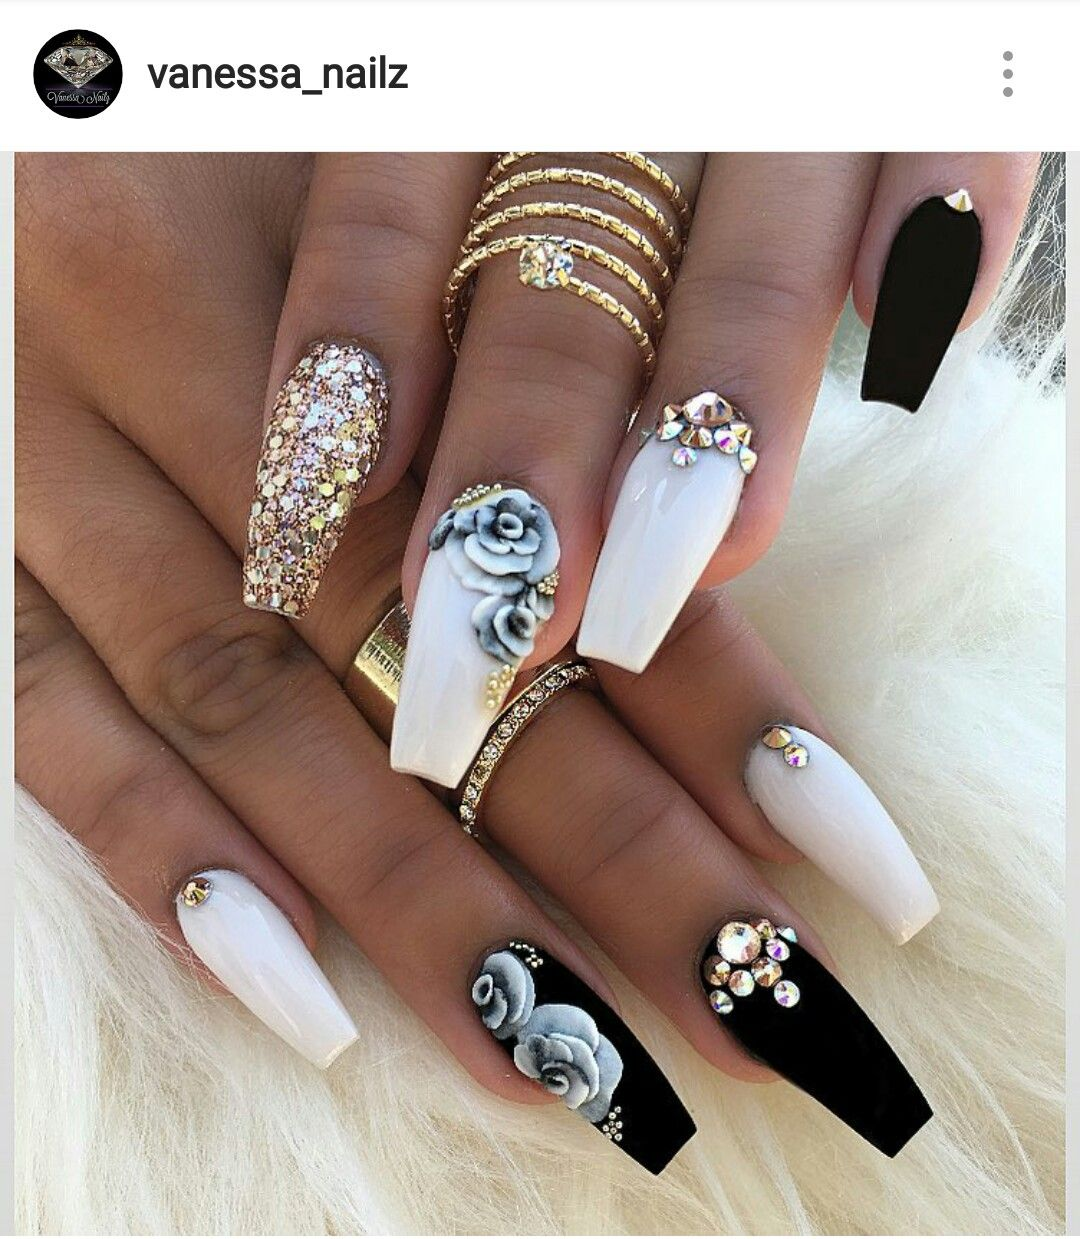 Black, White, & Gold Nails by @vanessa_nailz on IG♡ - Black, White, & Gold Nails By @vanessa_nailz On IG♡ Nails